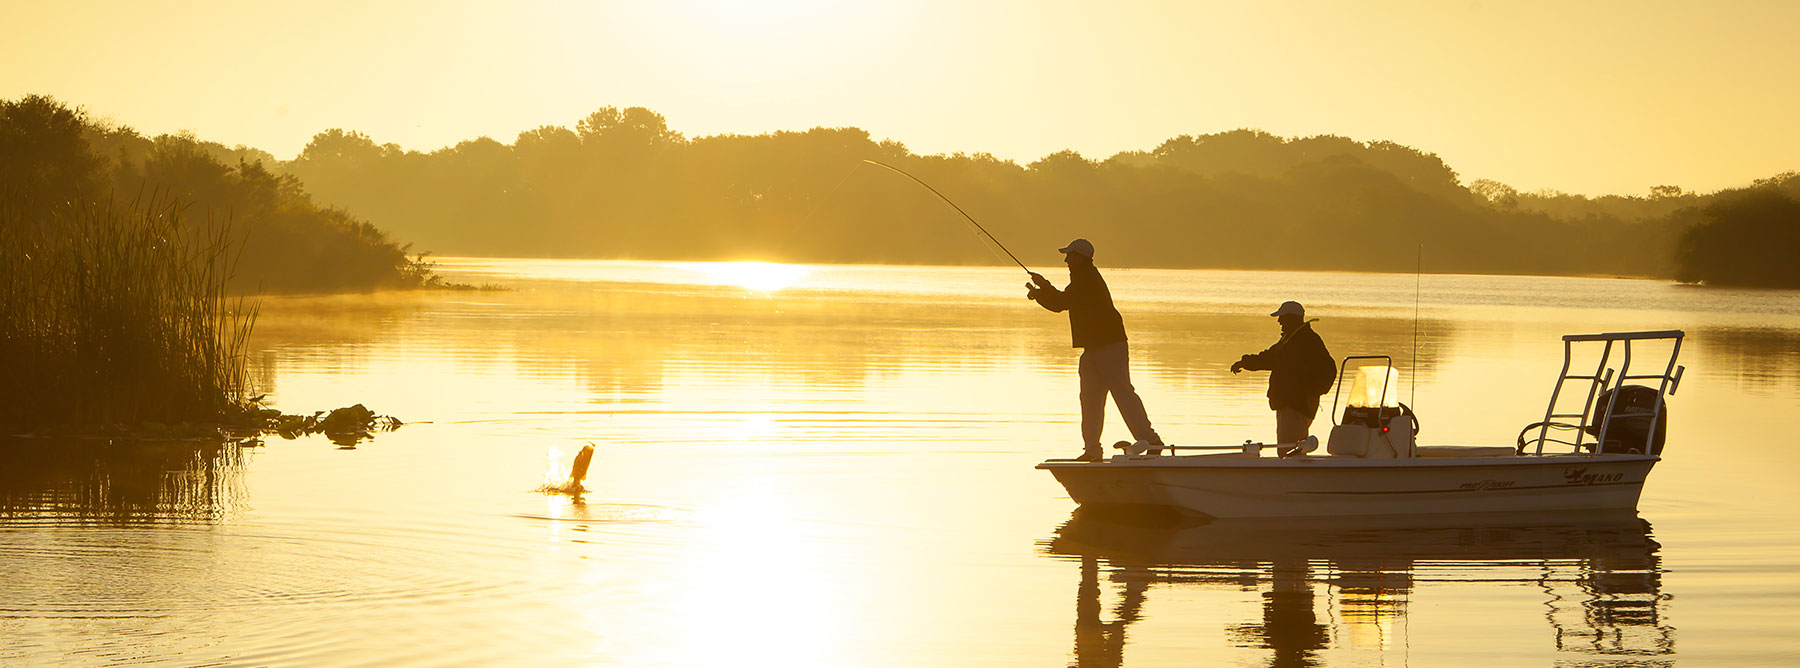 header-bass-fishing